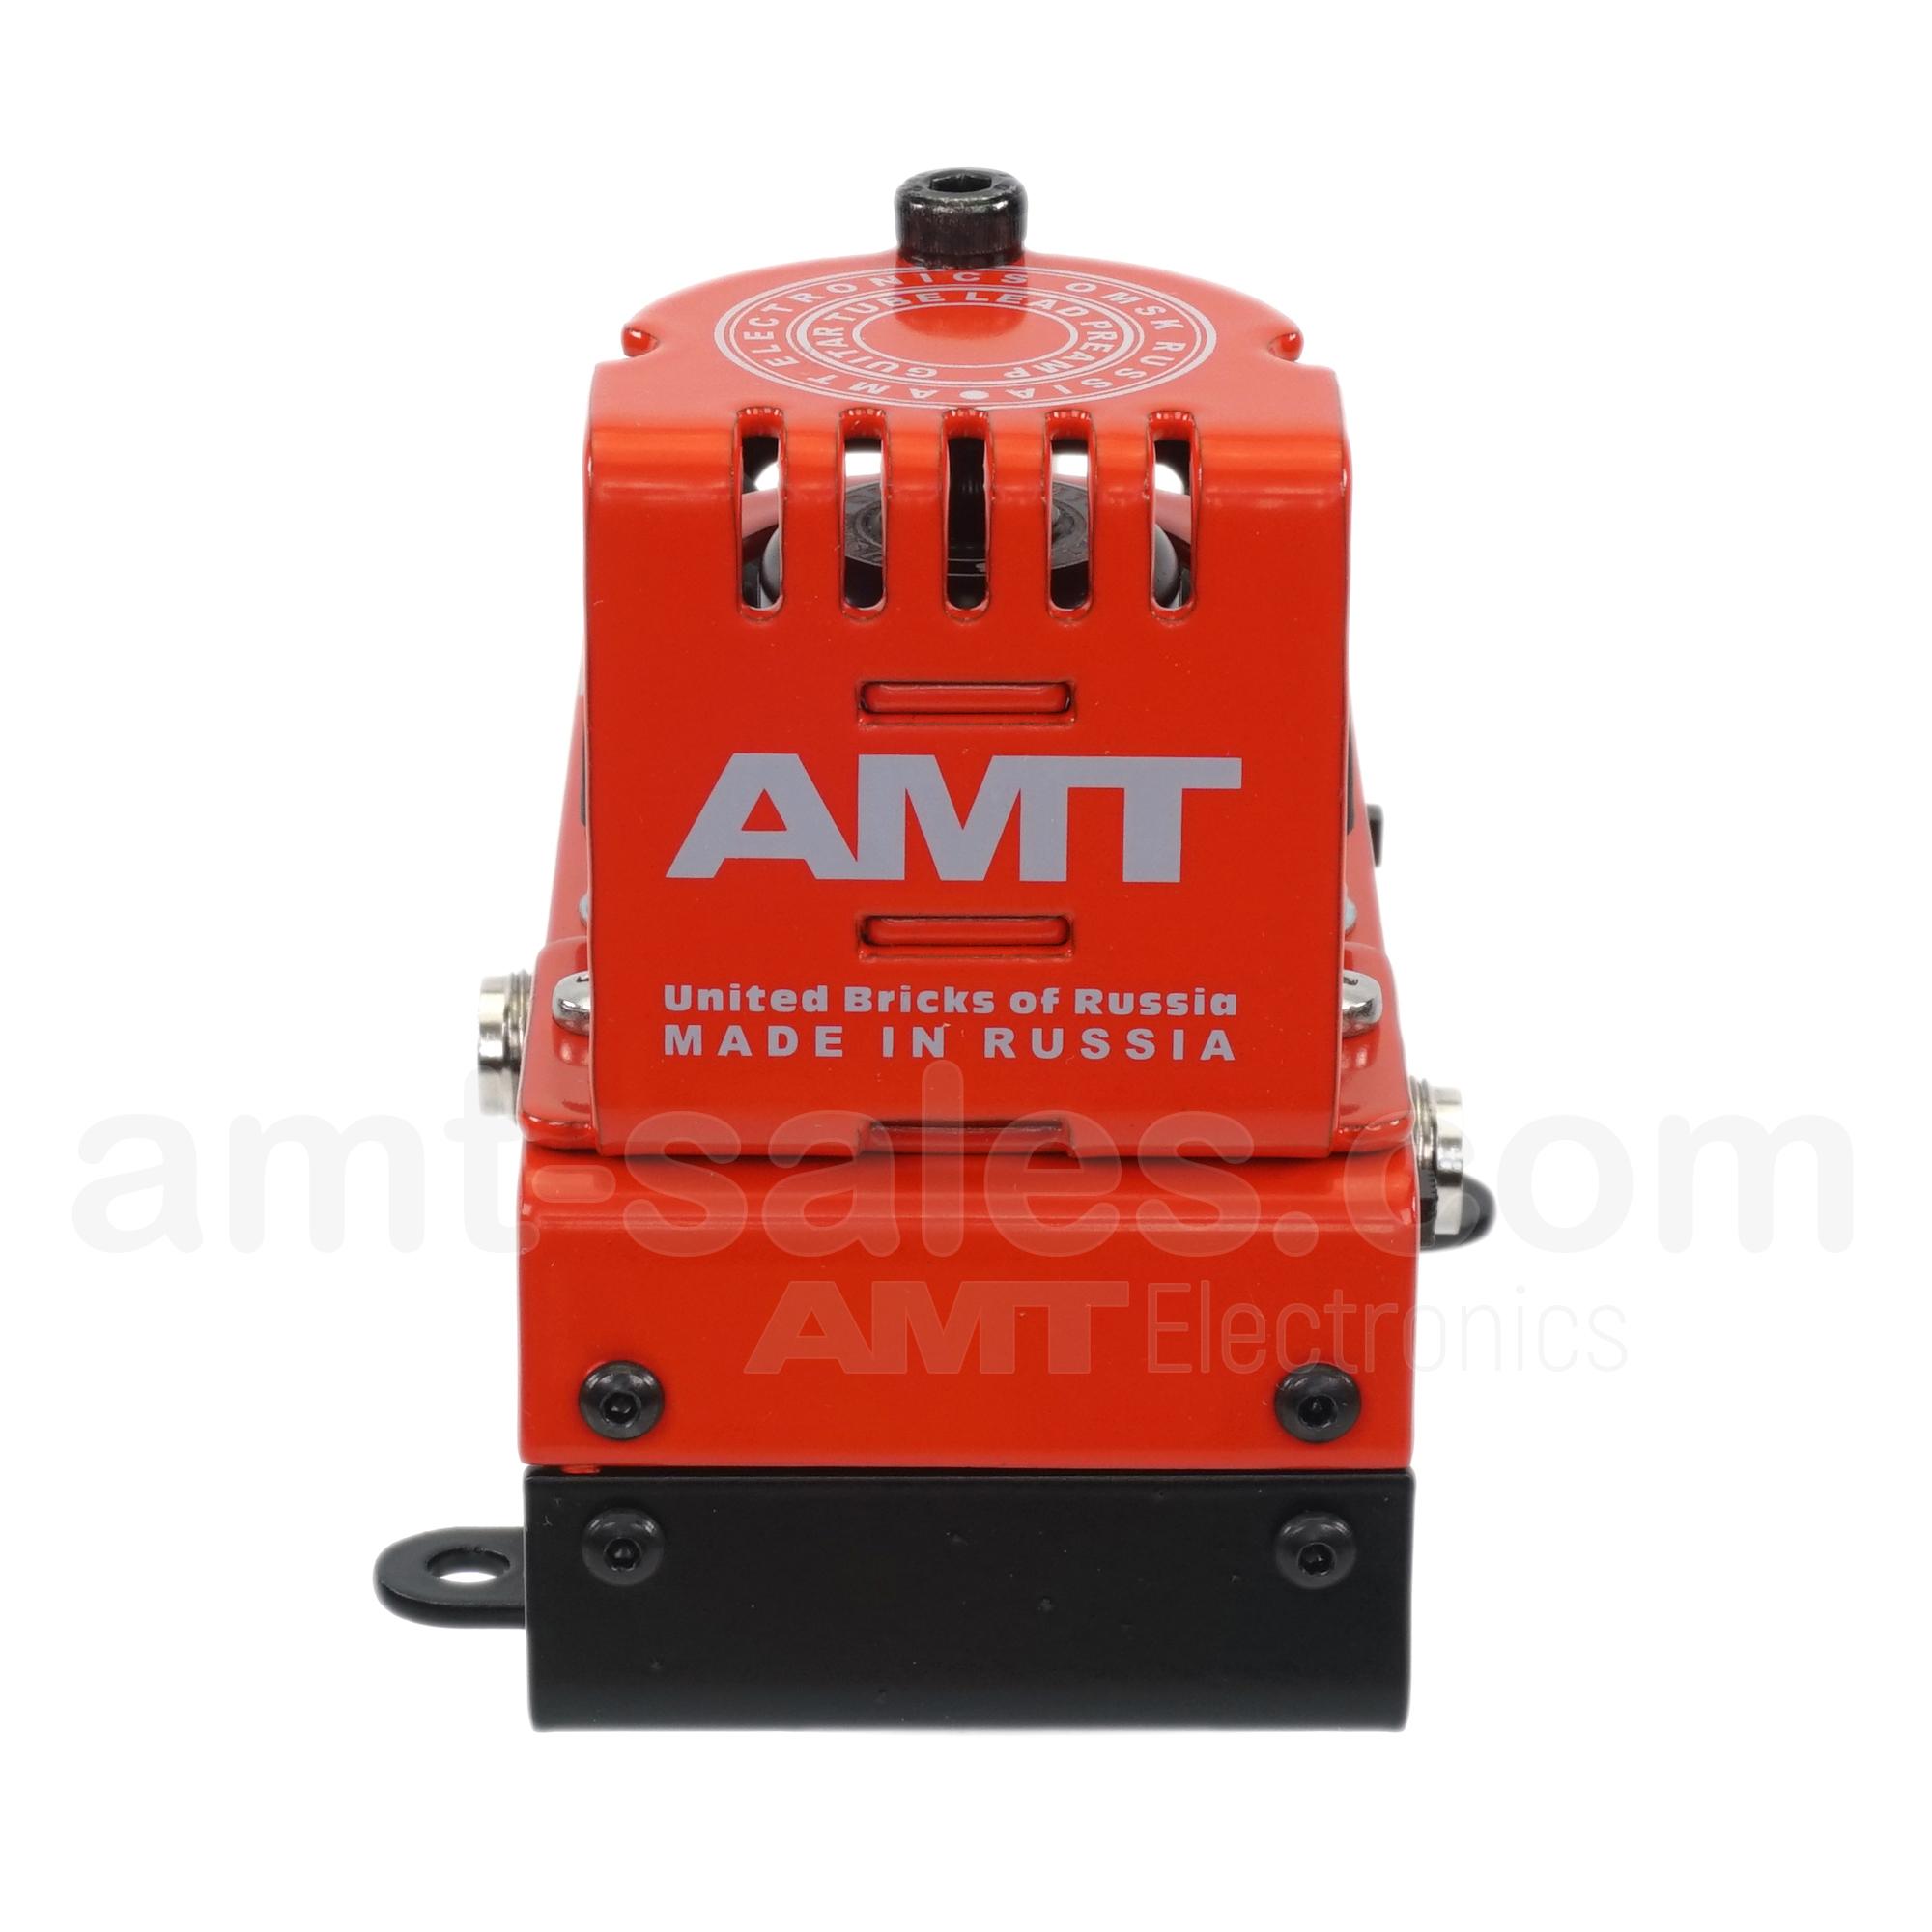 AMT Bricks R/S-Lead - Mesa/Soldano Emulates